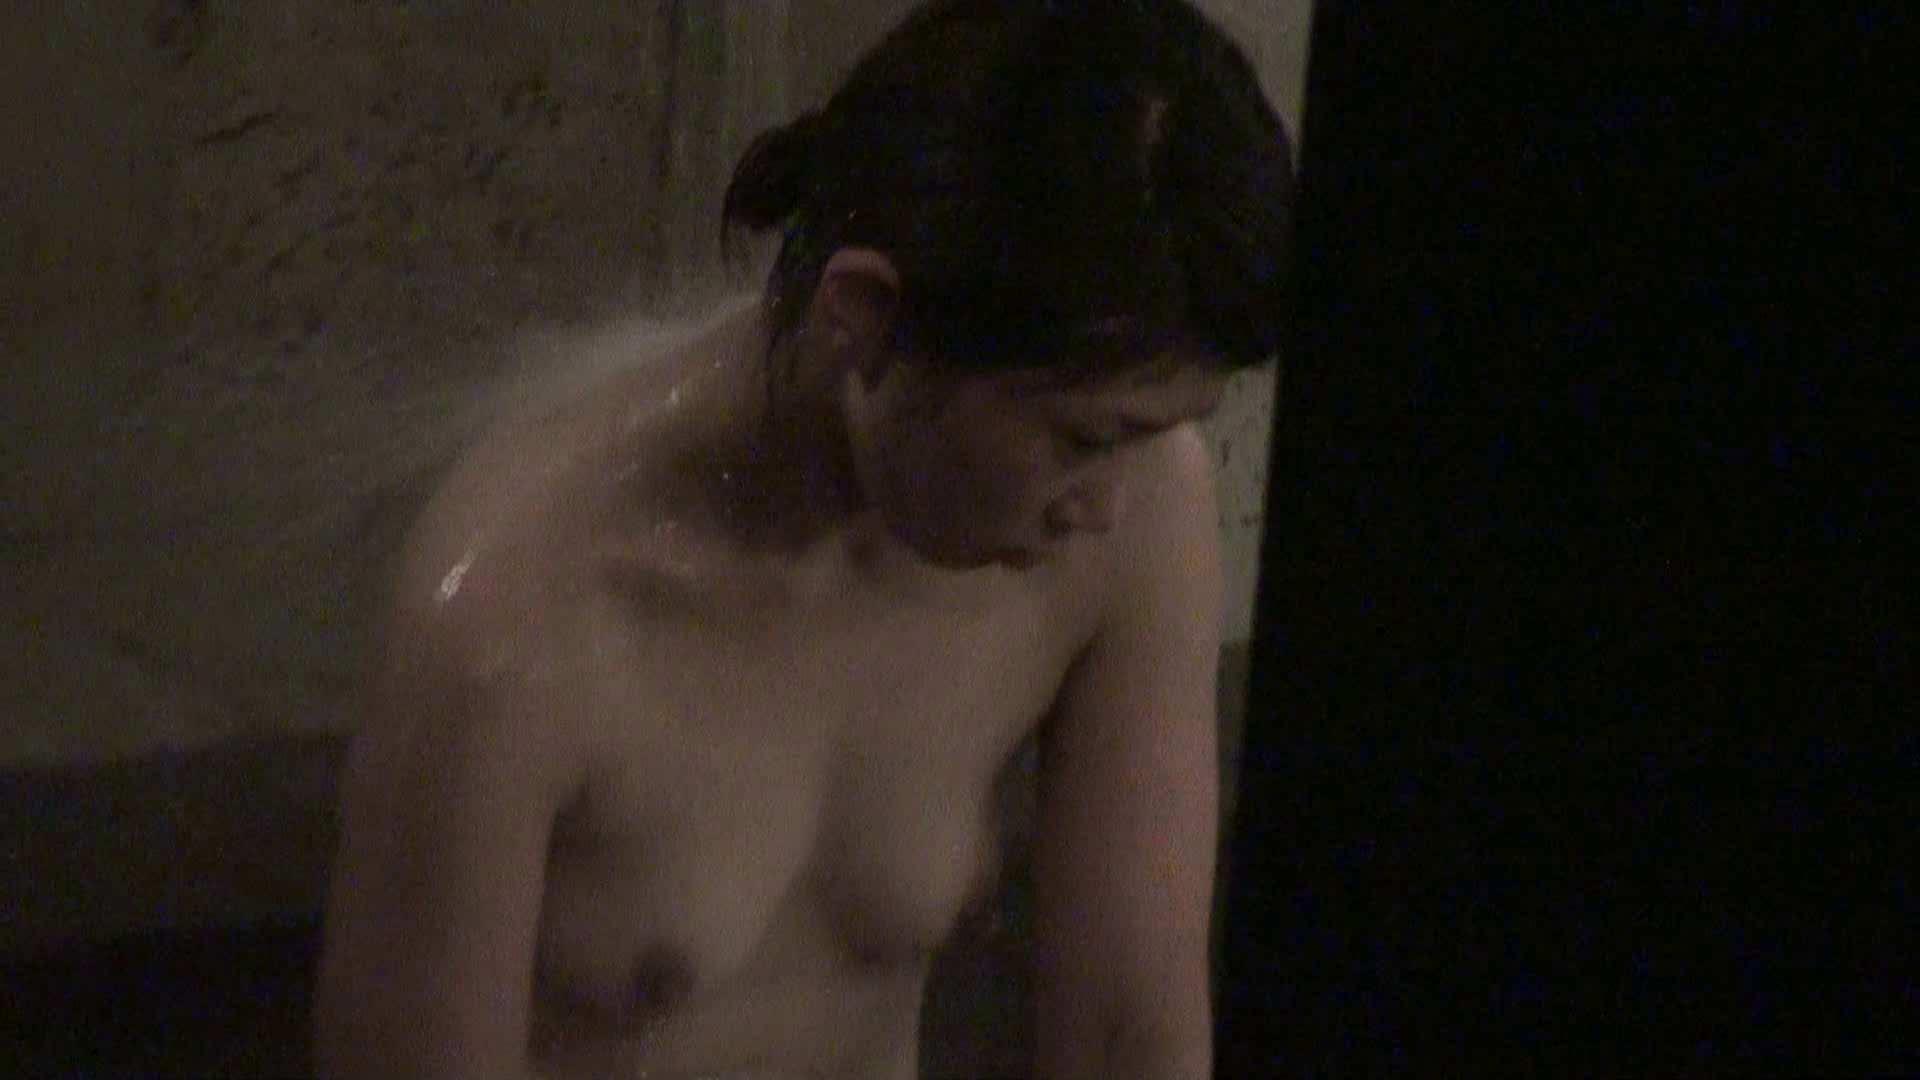 Aquaな露天風呂Vol.426 盗撮師作品  70pic 30